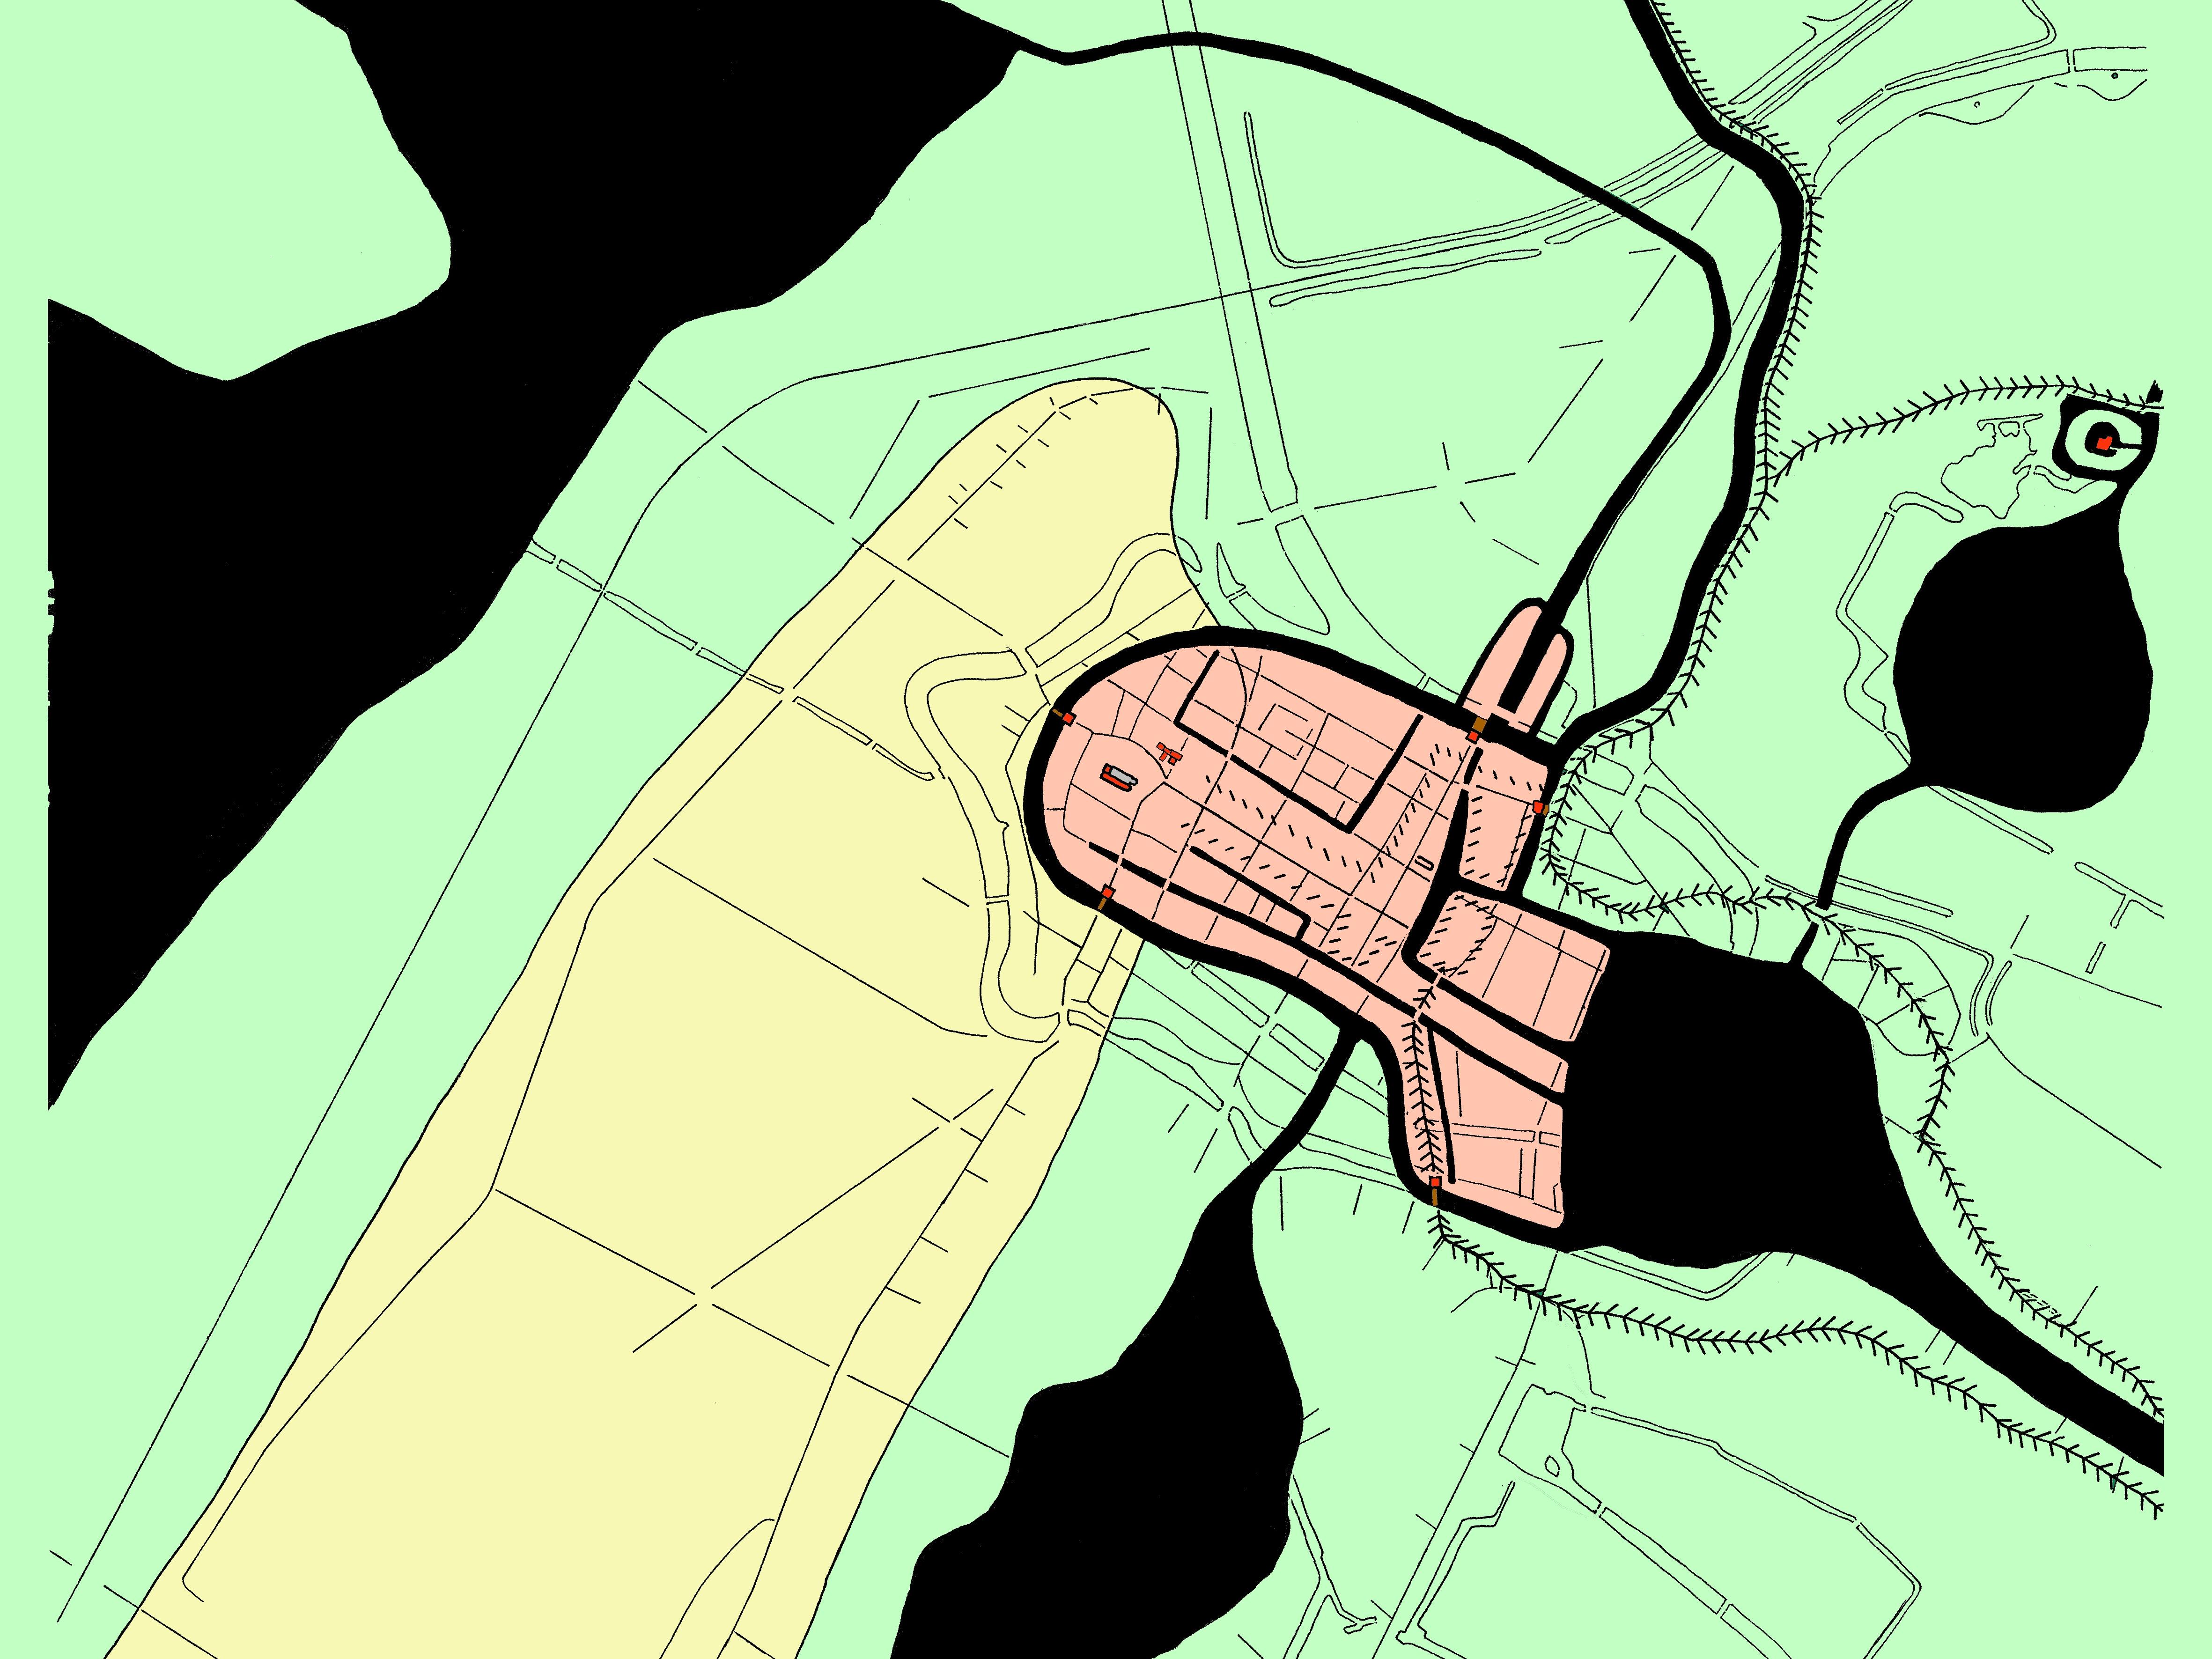 Alkmaar ca. 1400